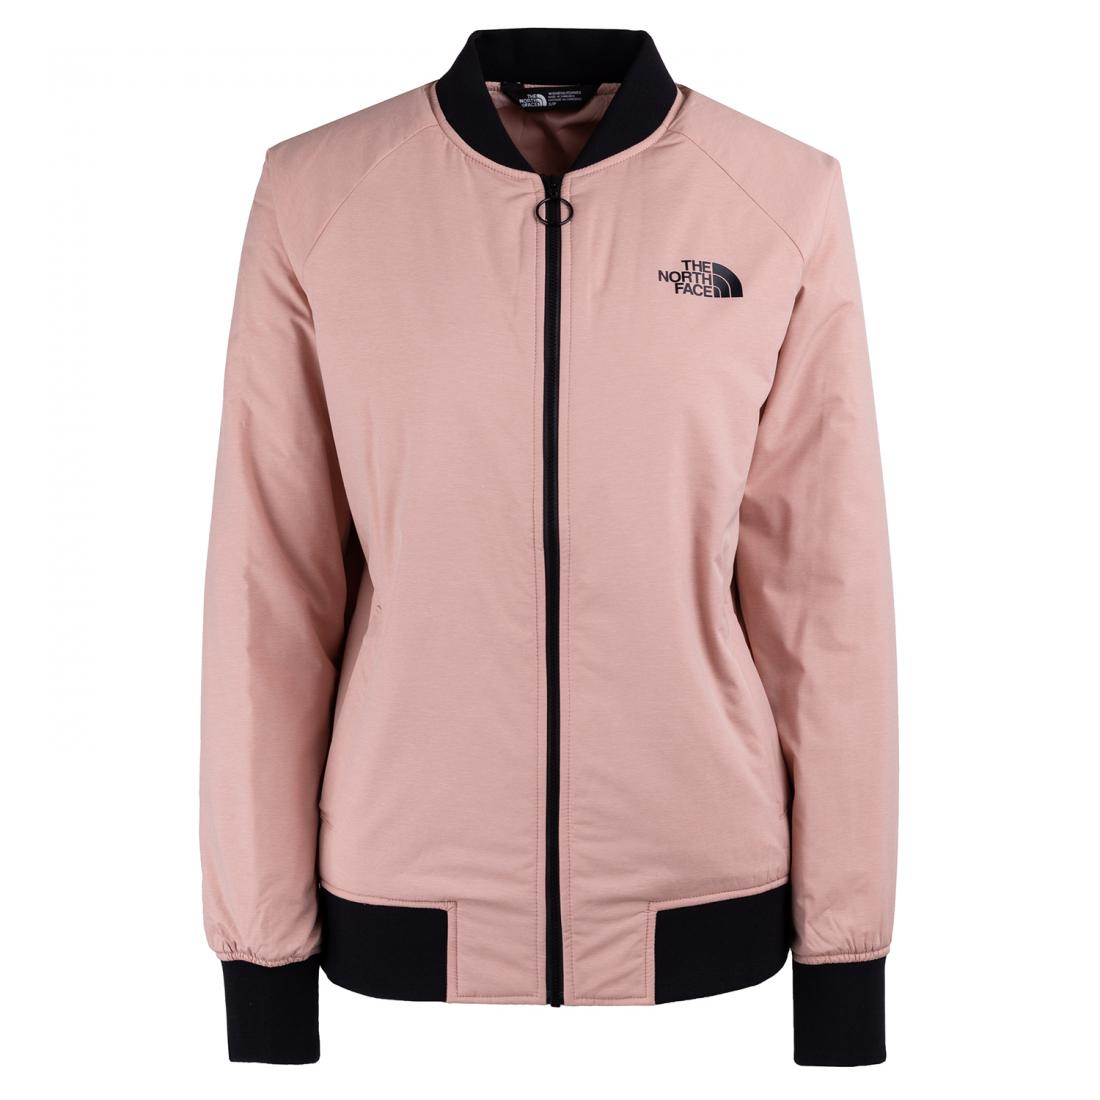 Куртка The North Face Co_mfy Insulated Bomber купить в Boardshop №1